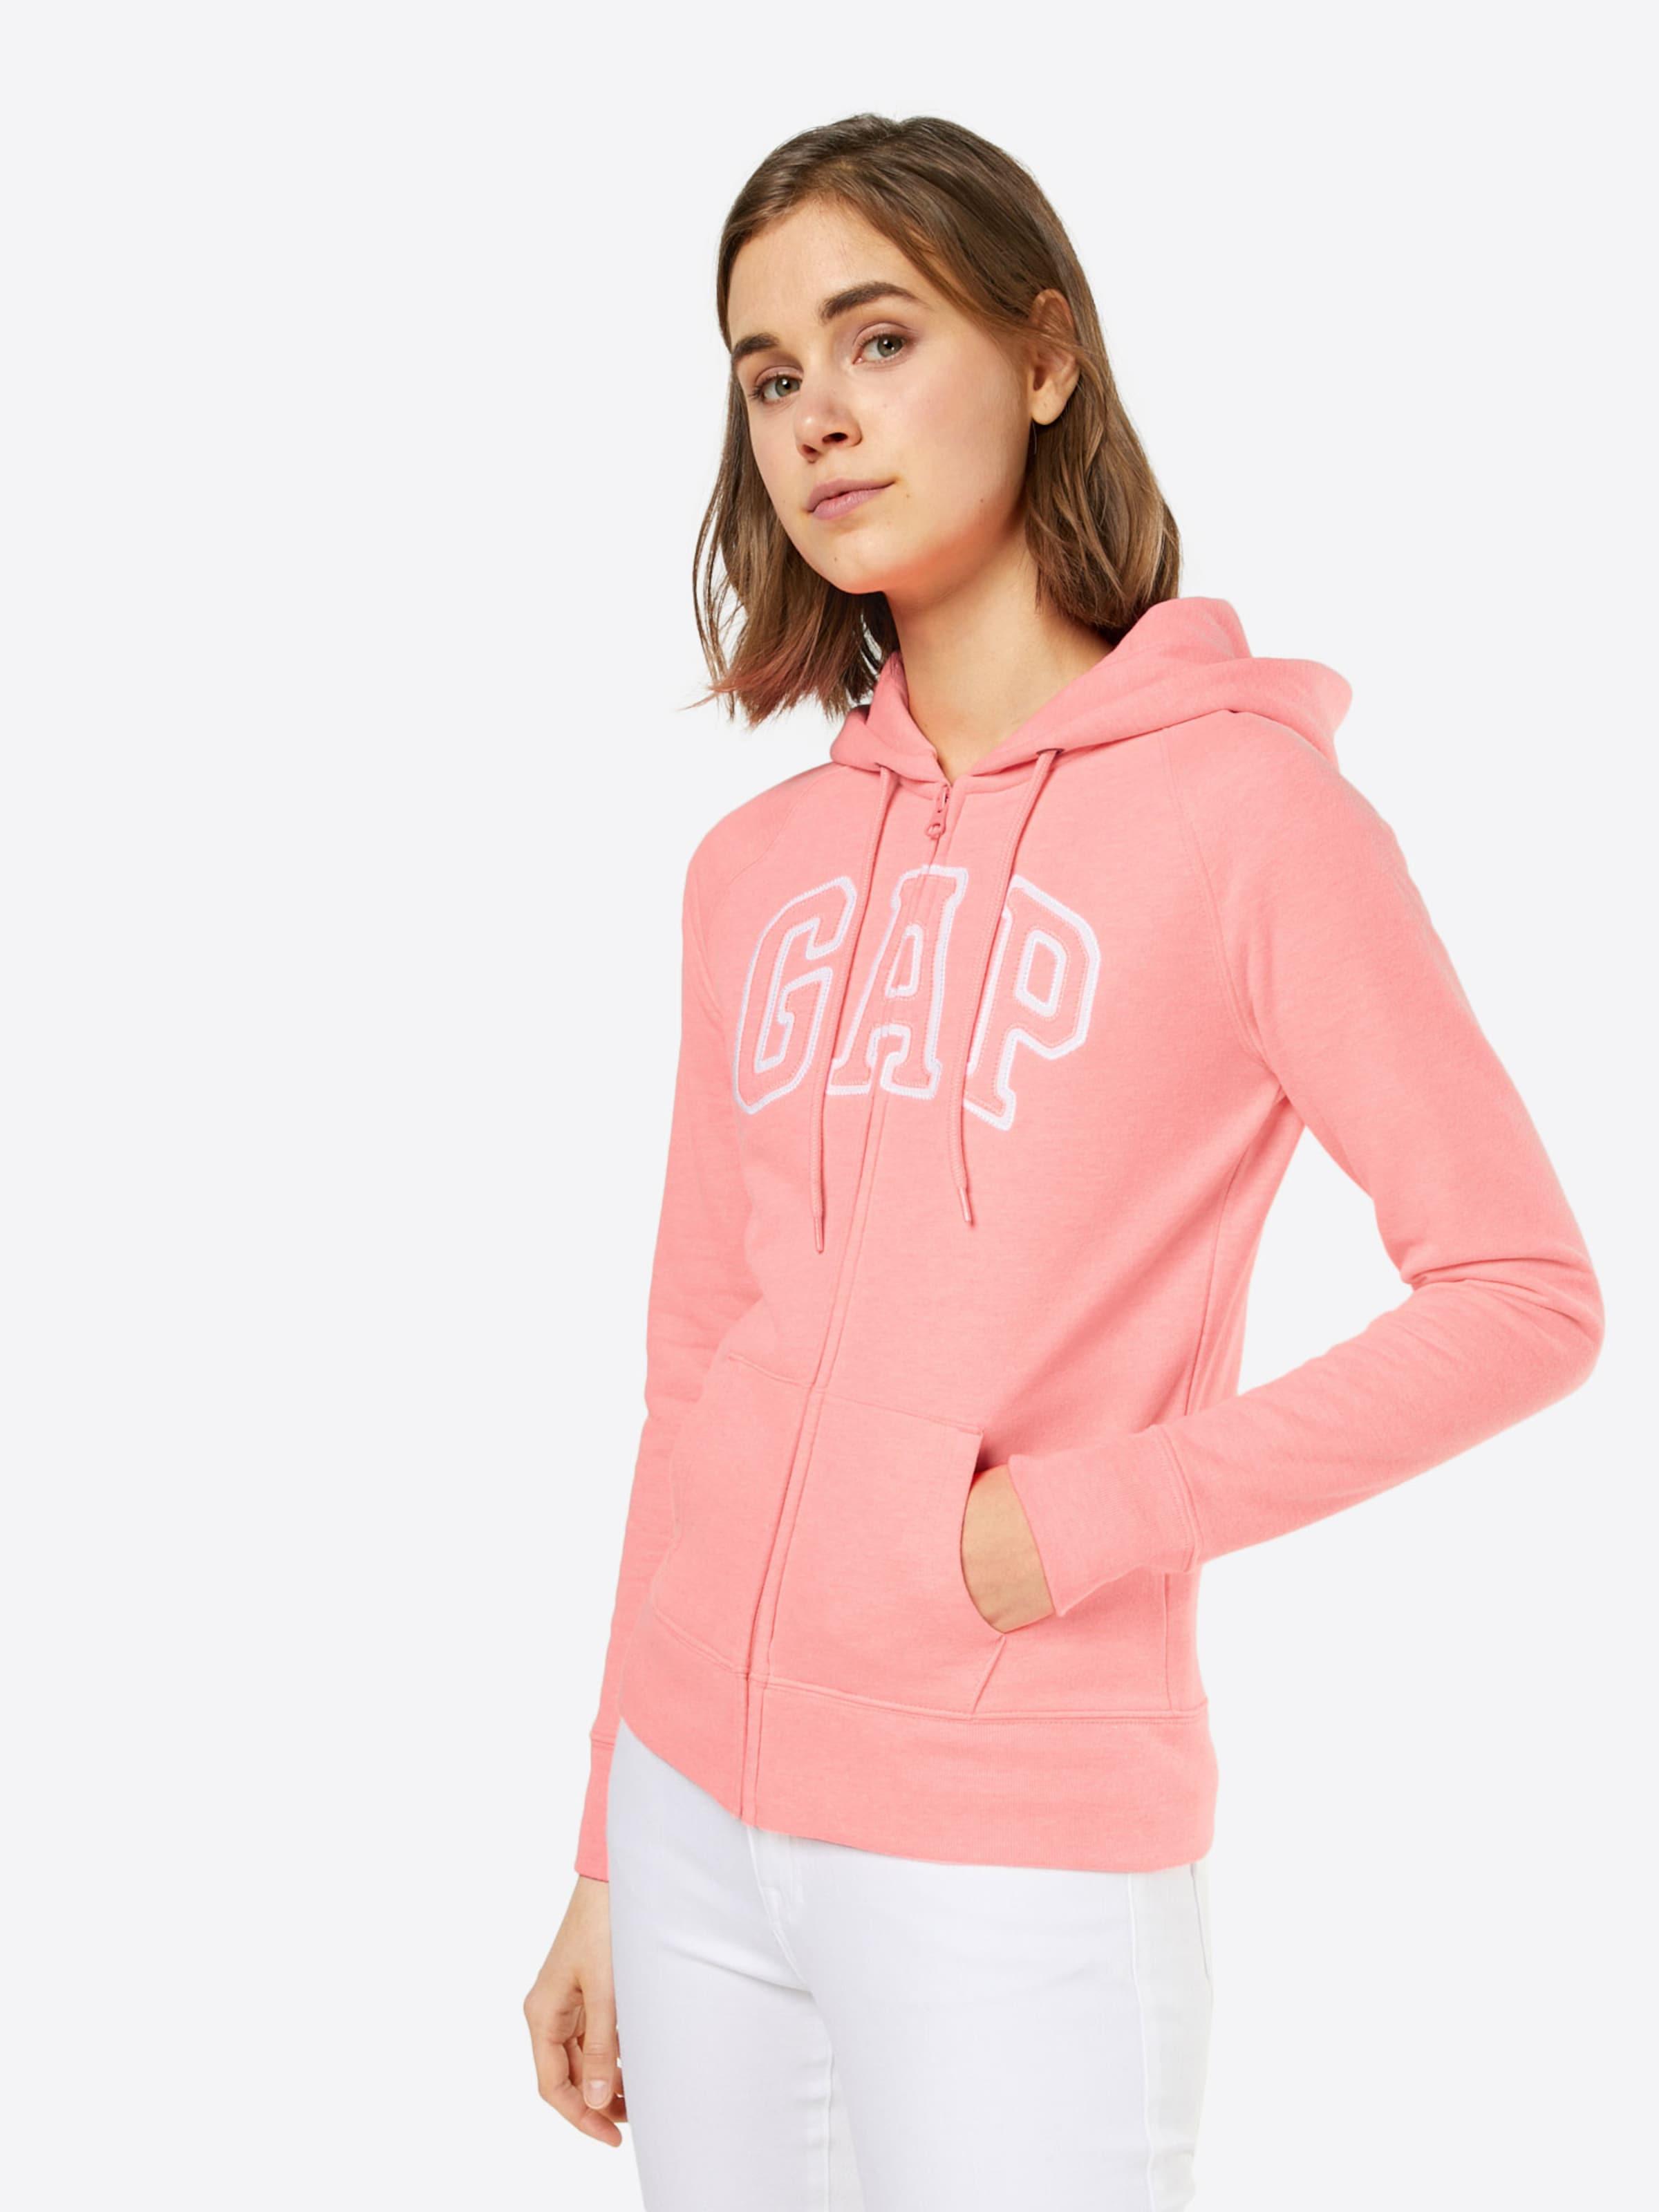 GAP Sweatshirtjacke 'LOGO' Verkauf Erkunden YZRl8Pje